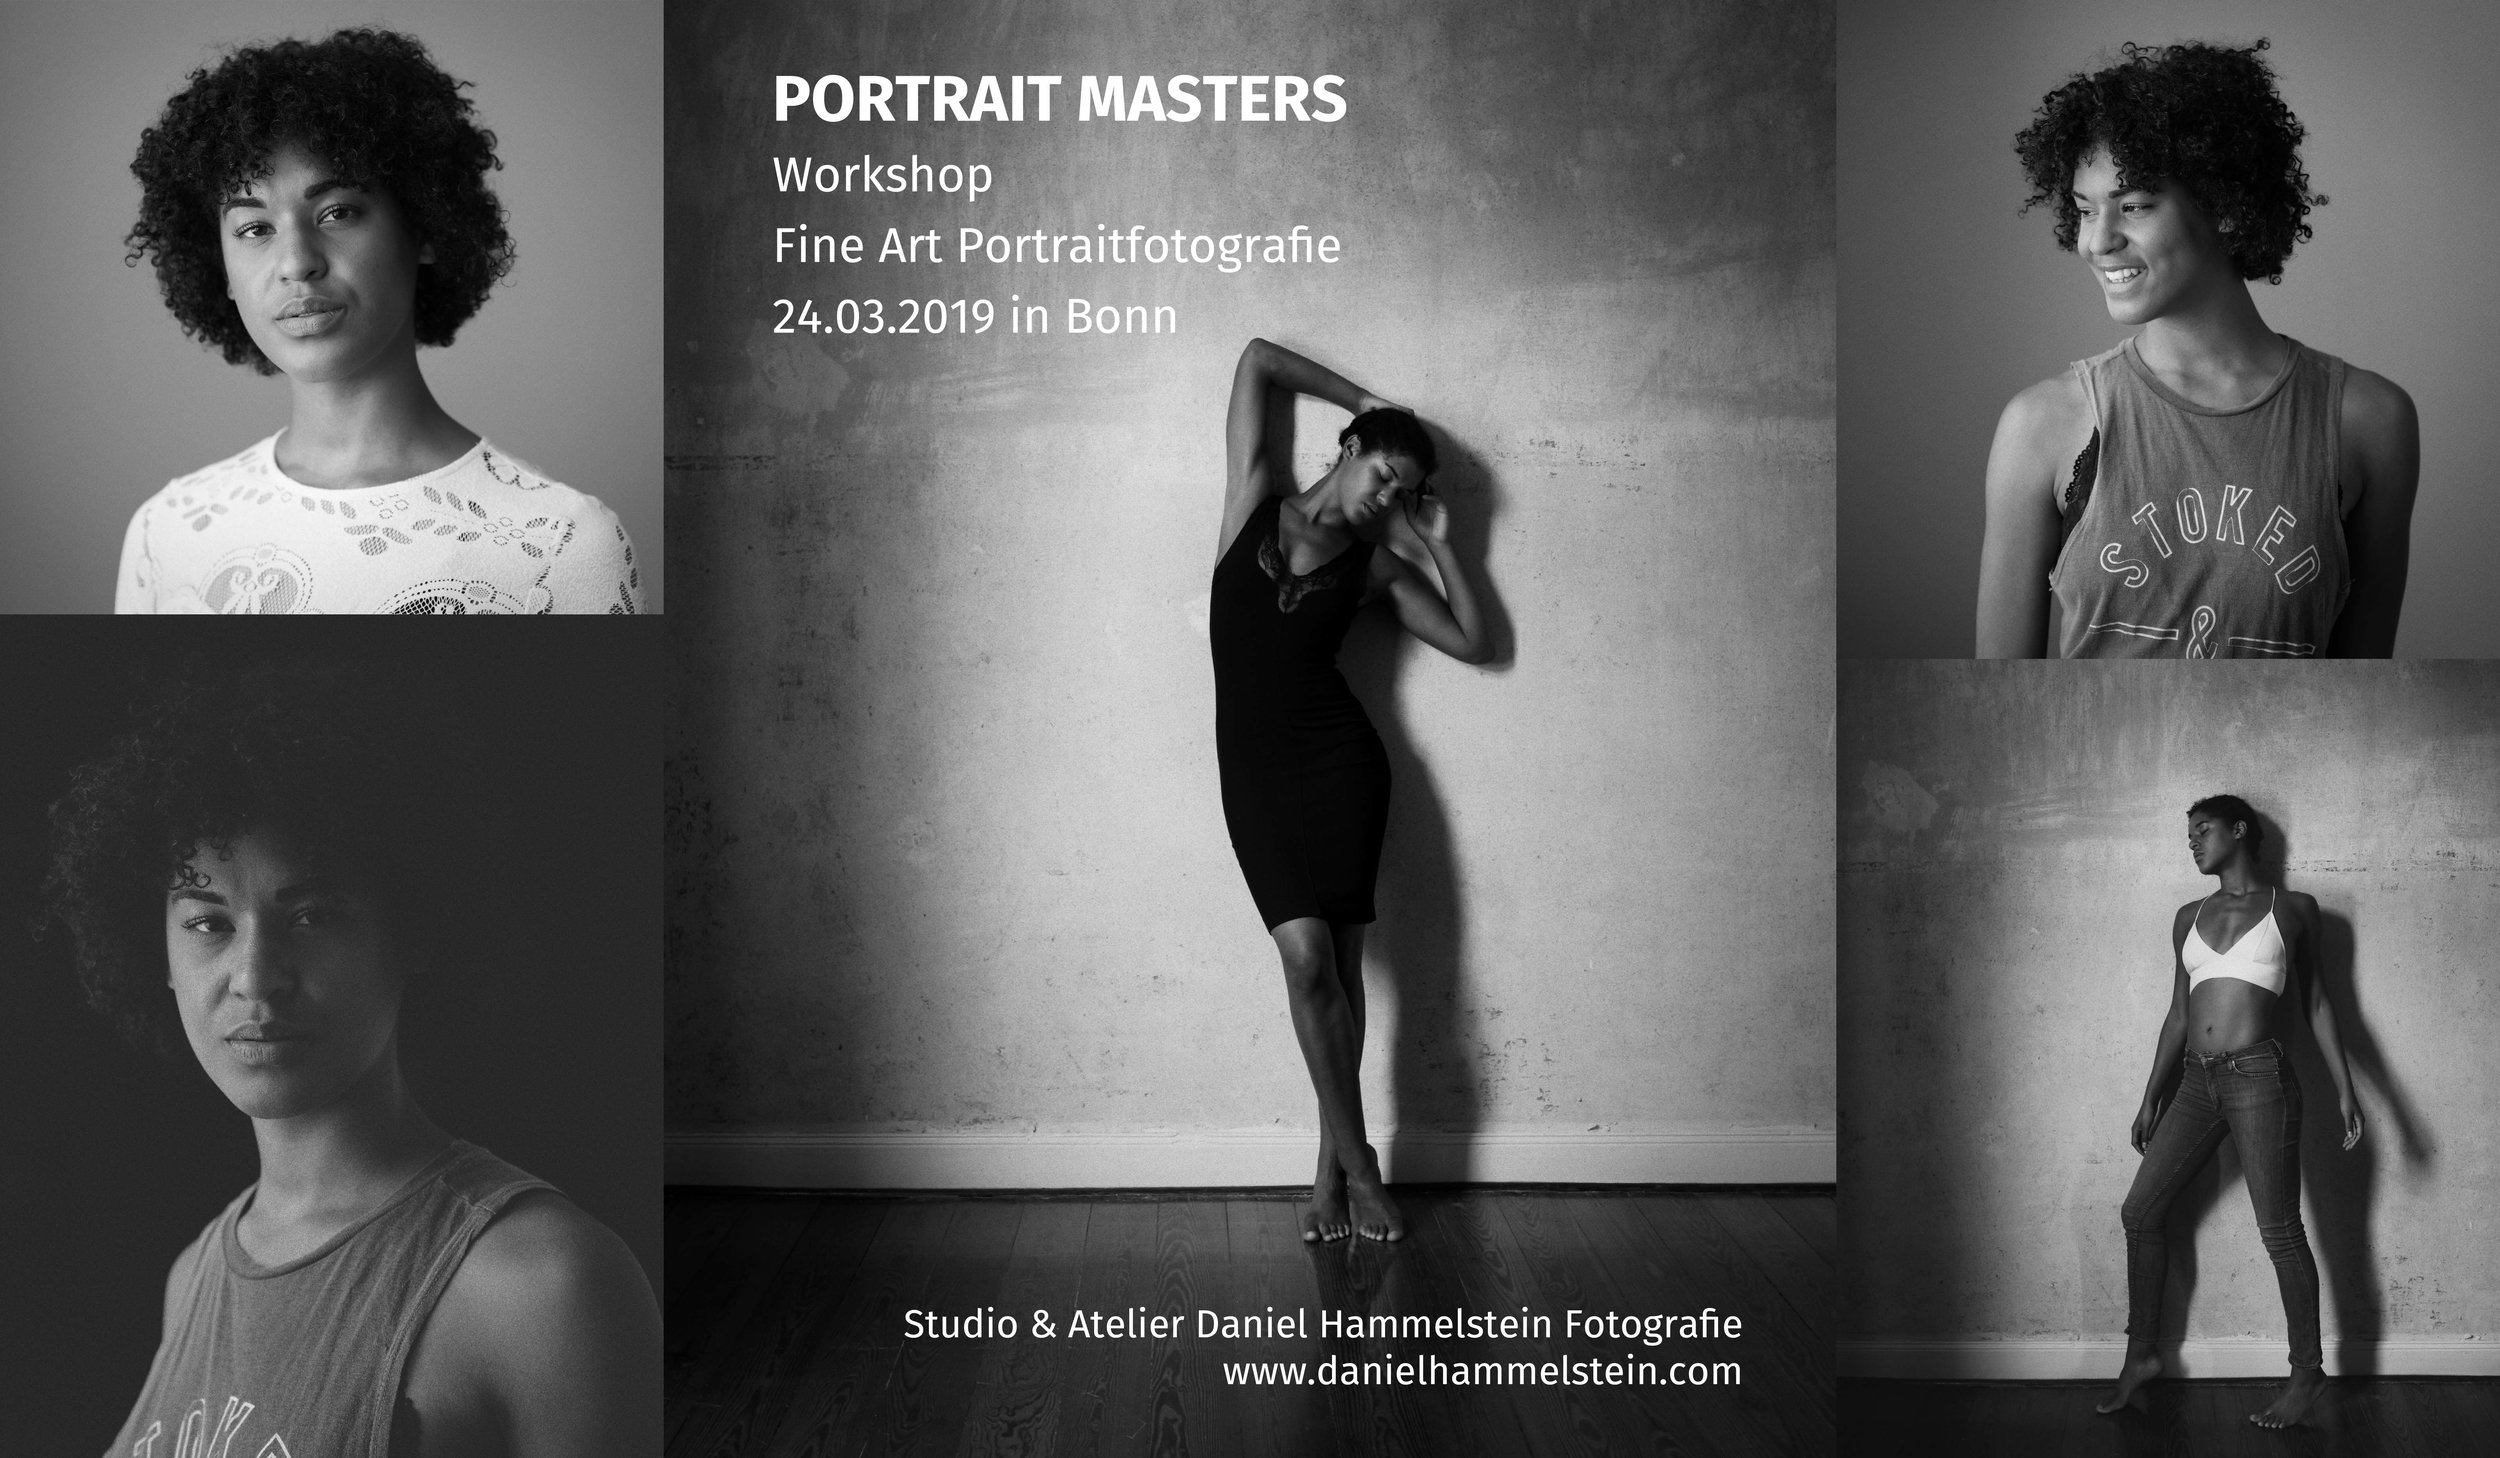 Portrait Workshop Portraitfotografie Schwarzweissfotografie Fotoworkshop Fotokurs Bonn Köln Düsseldorf NRW März 2019.jpg